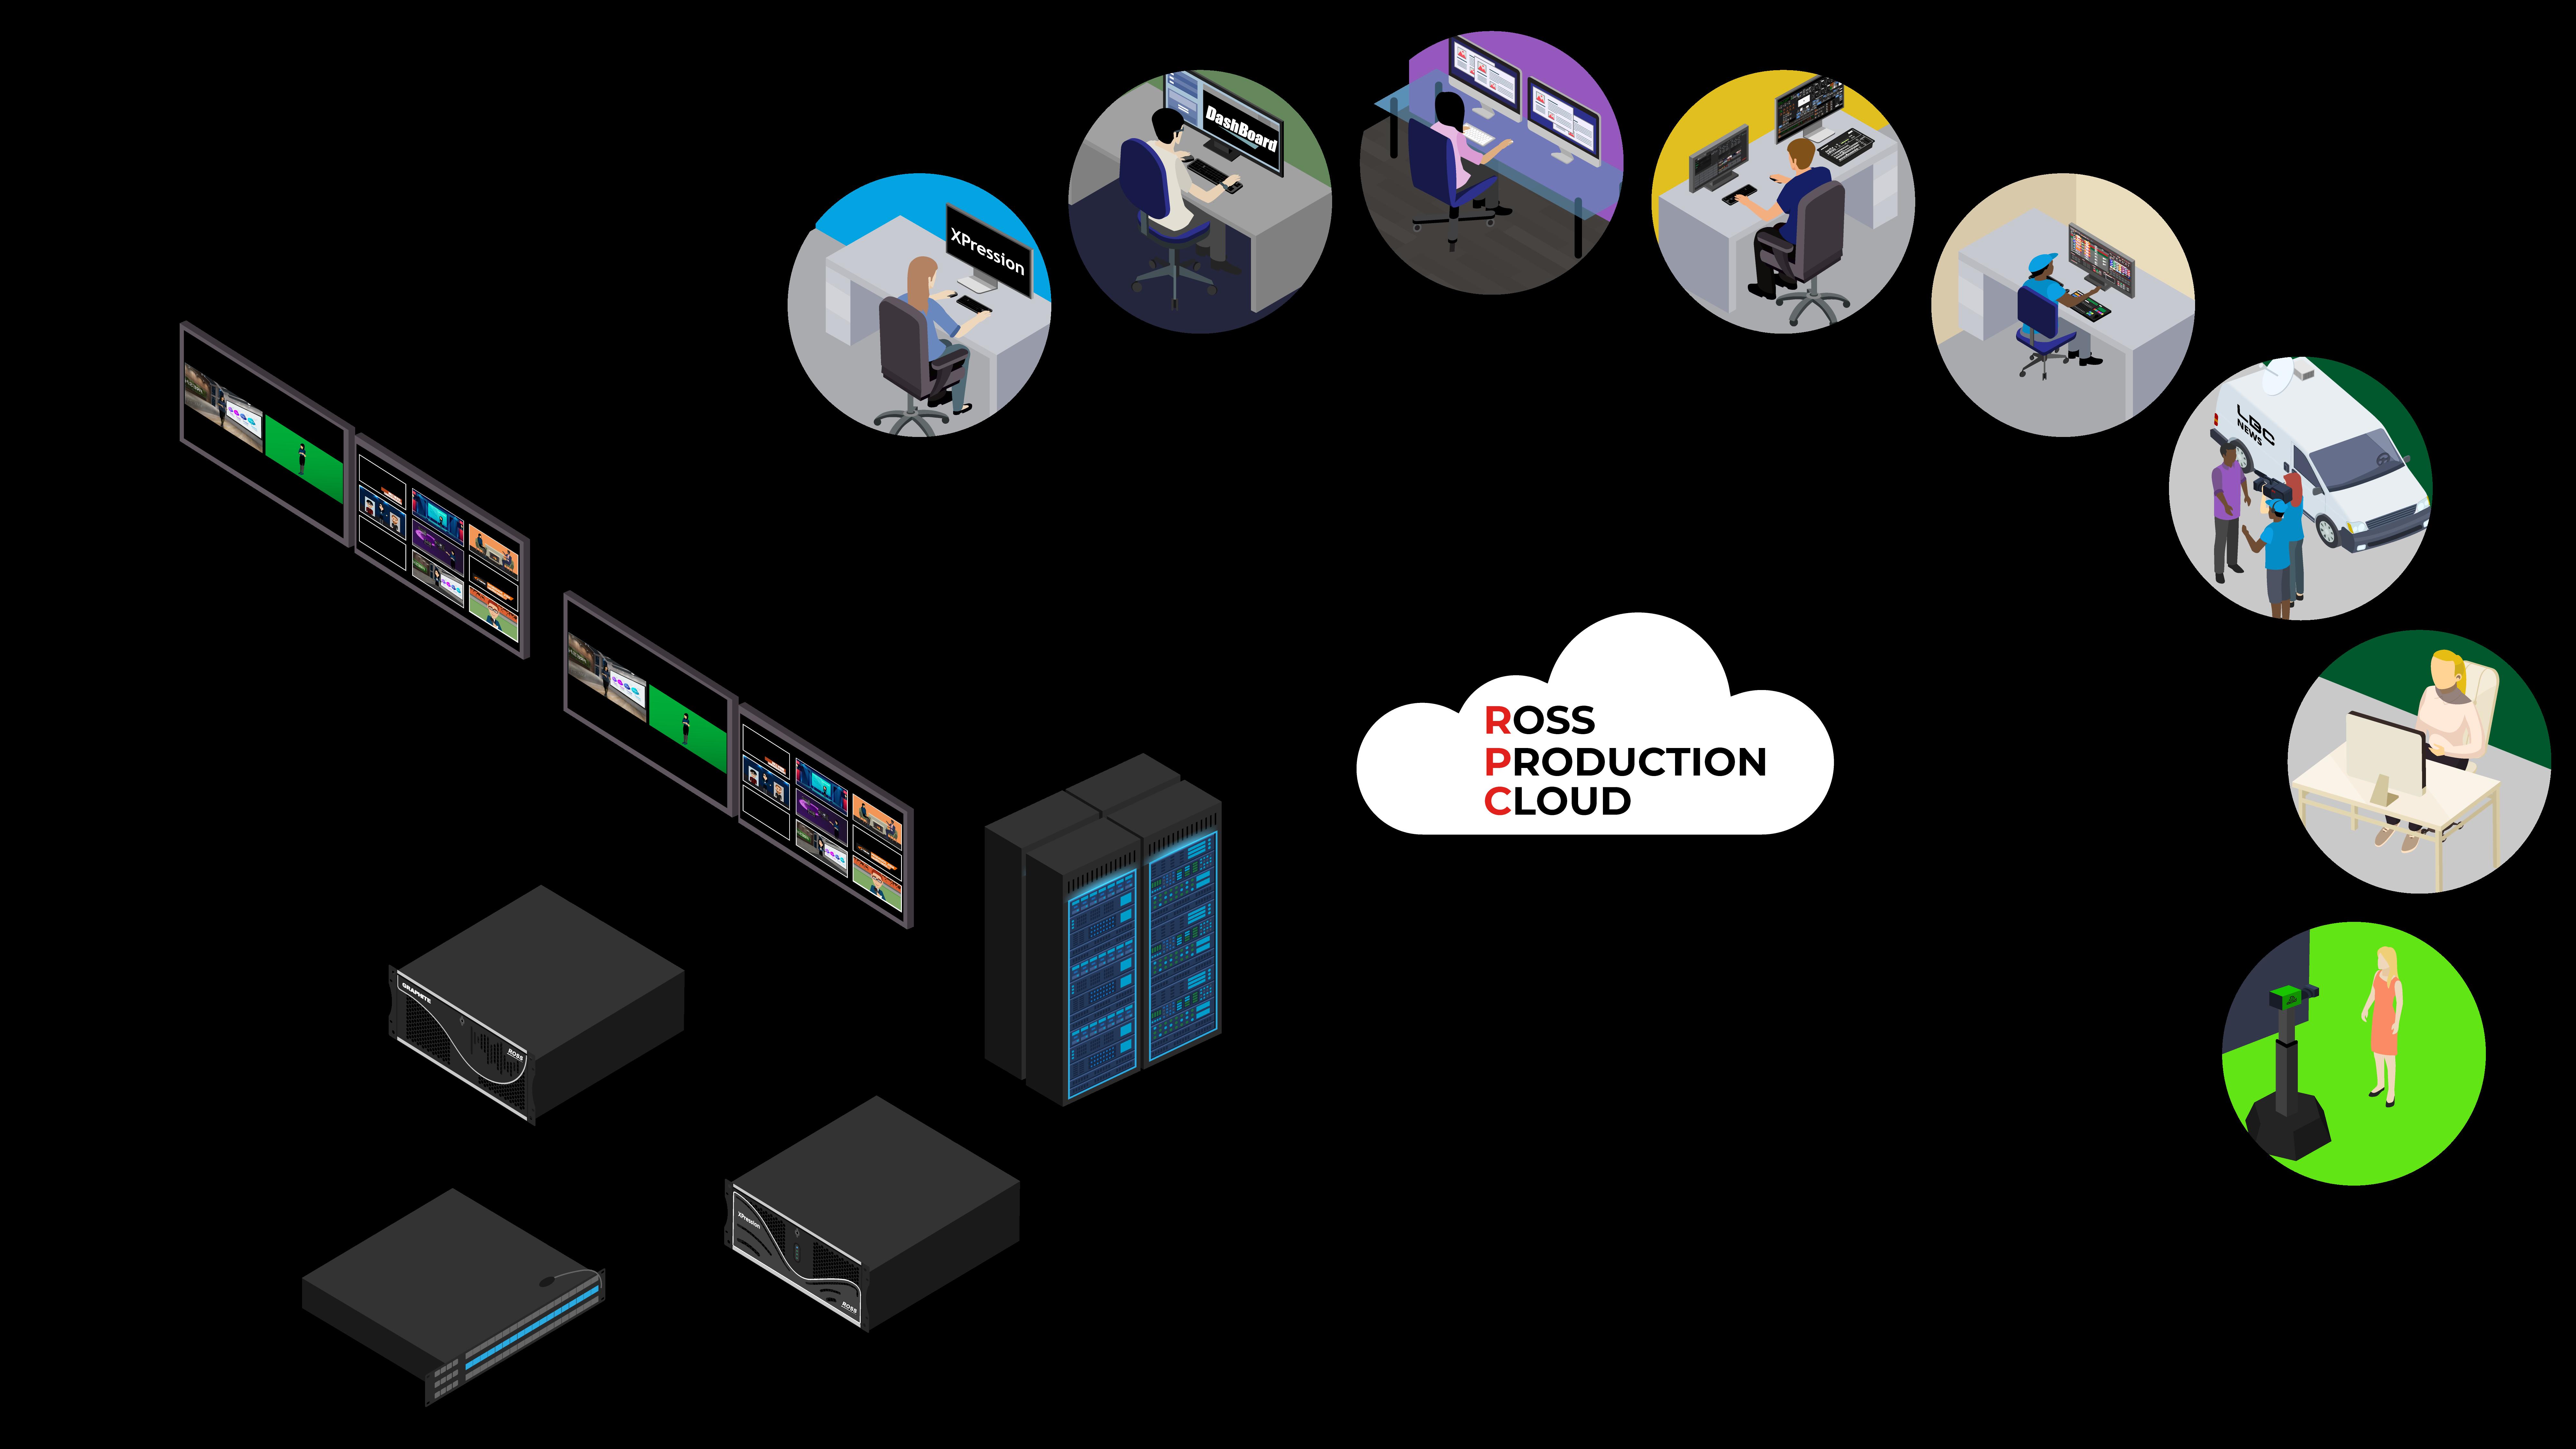 Diagram of Ross Production Cloud